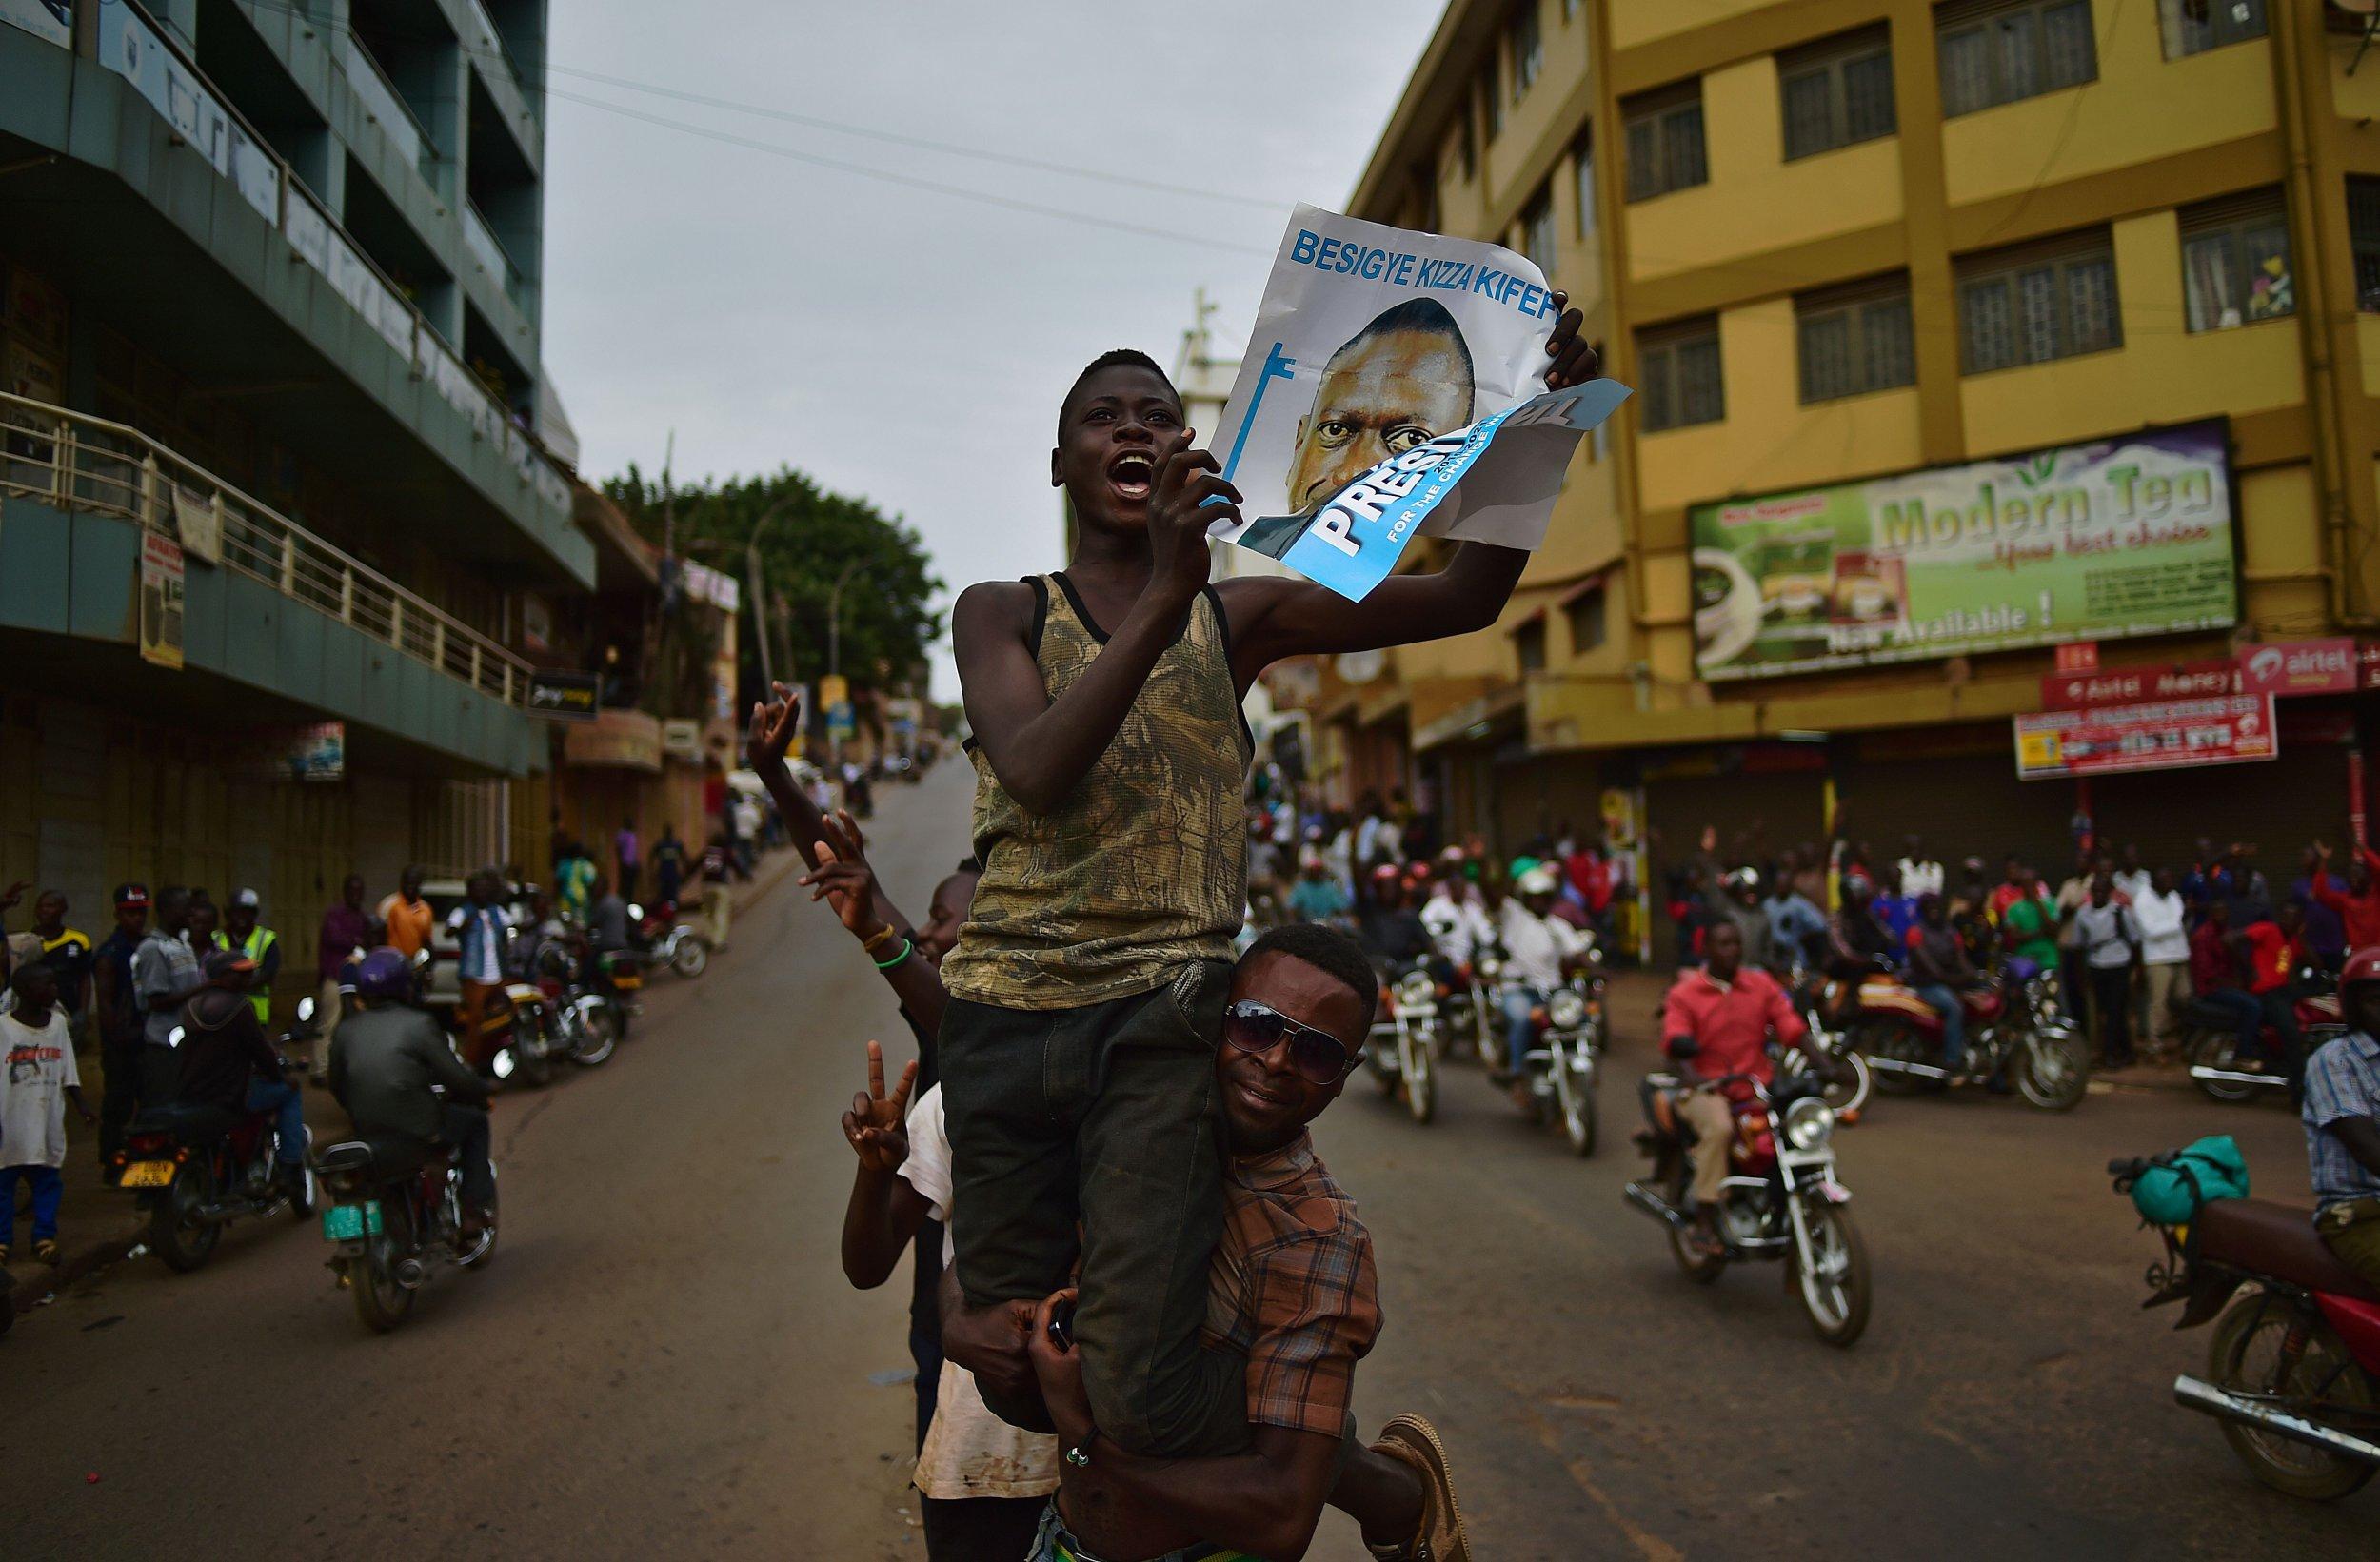 Kizza Besigye supporters cheer in Kampala.